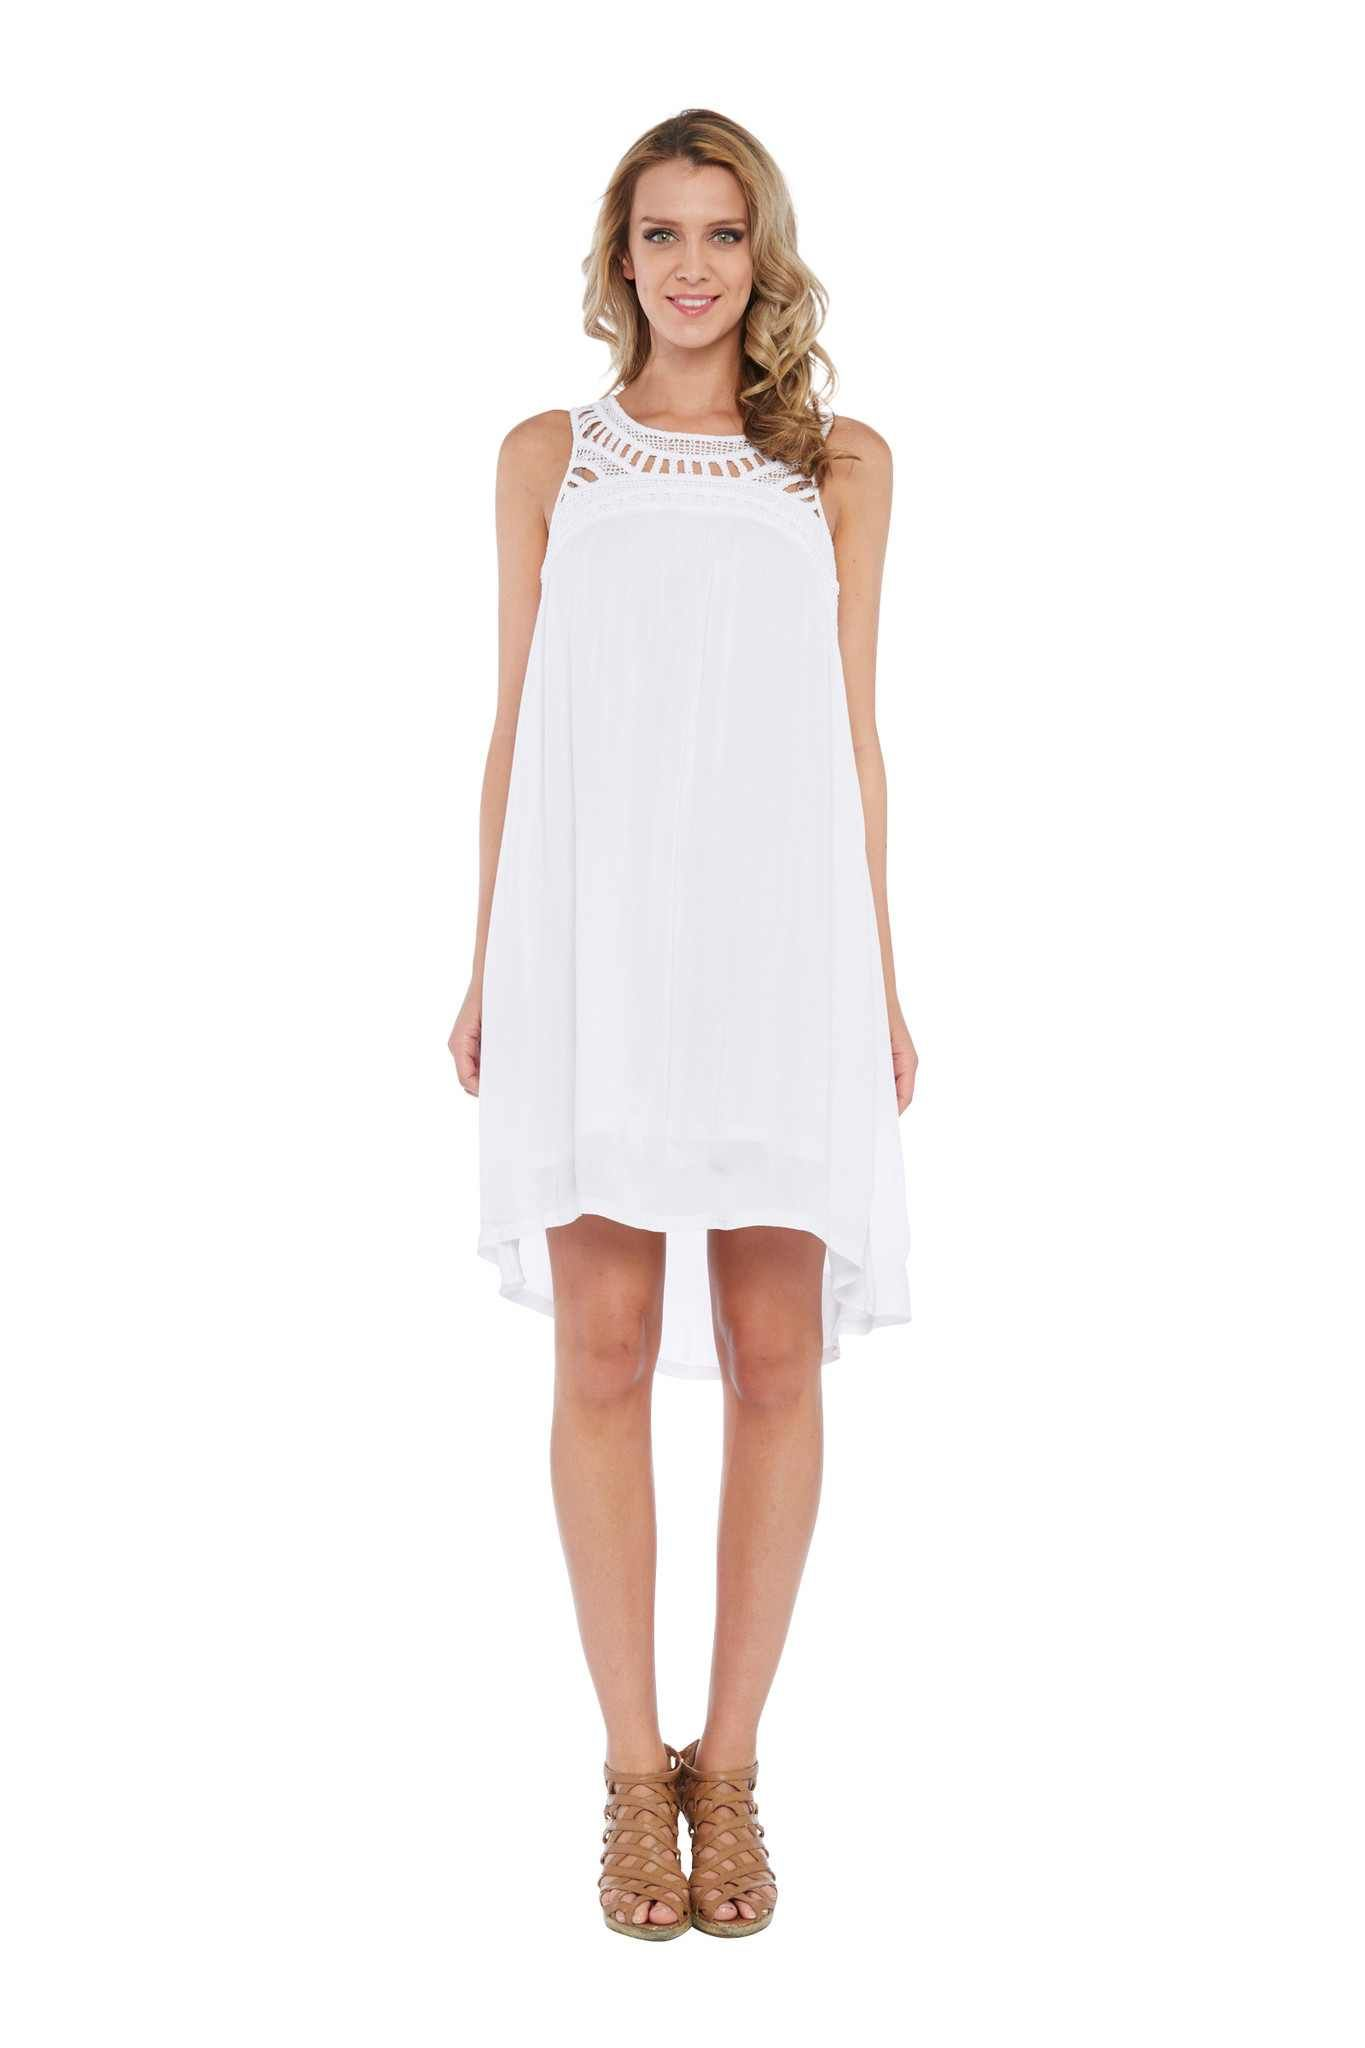 Kaktus Resort 16 Crochet Neckline Trapeze Dress In White Crochet Contemporary Outfits White Dress Dresses [ 2048 x 1365 Pixel ]